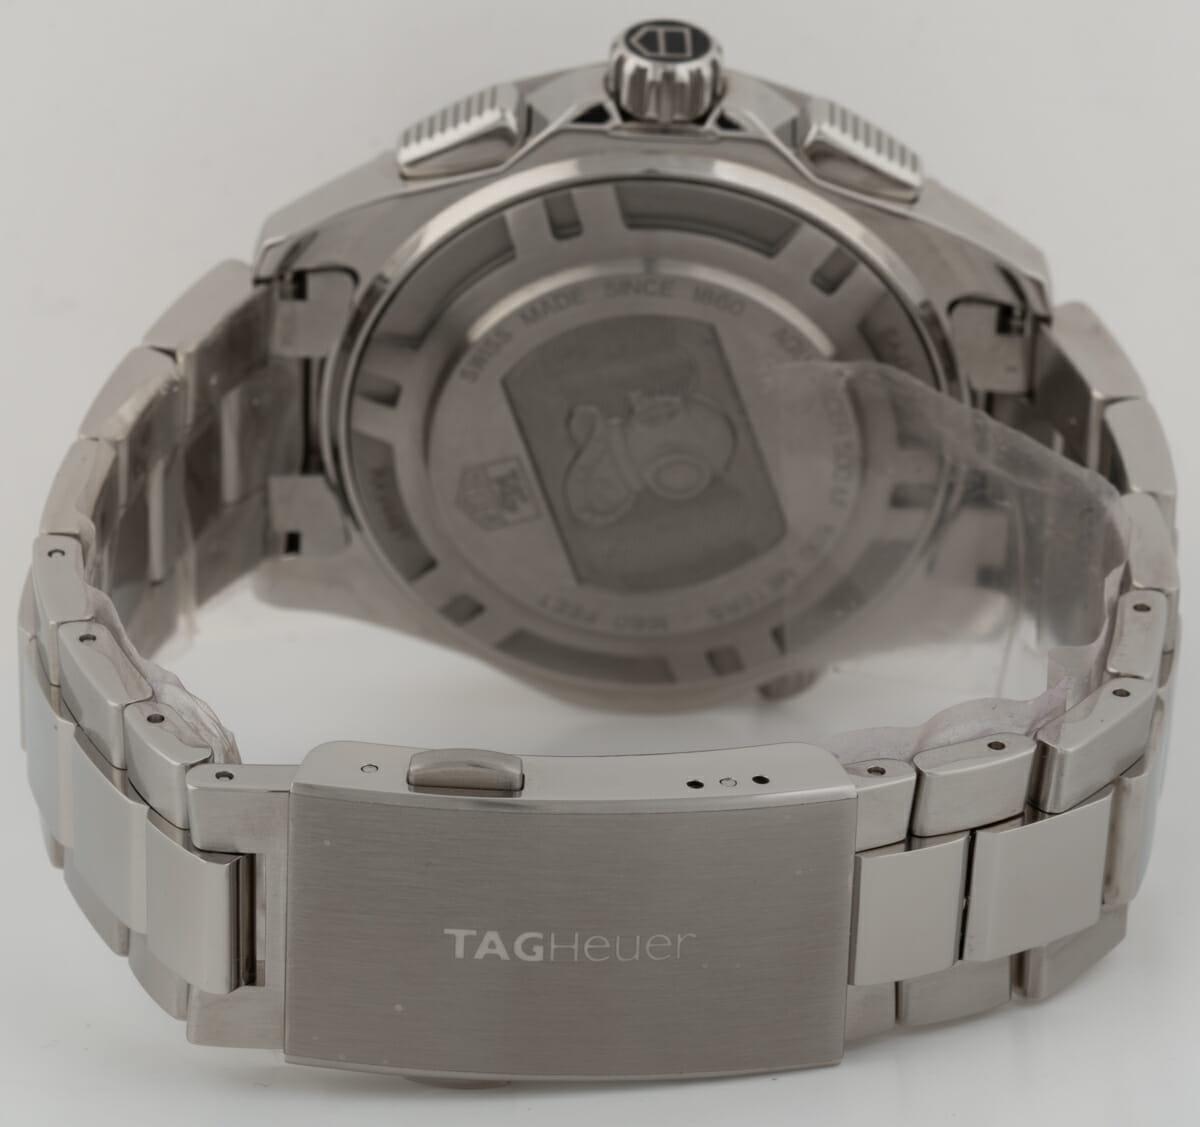 Rear / Band View of Aquaracer 500m Chronograph